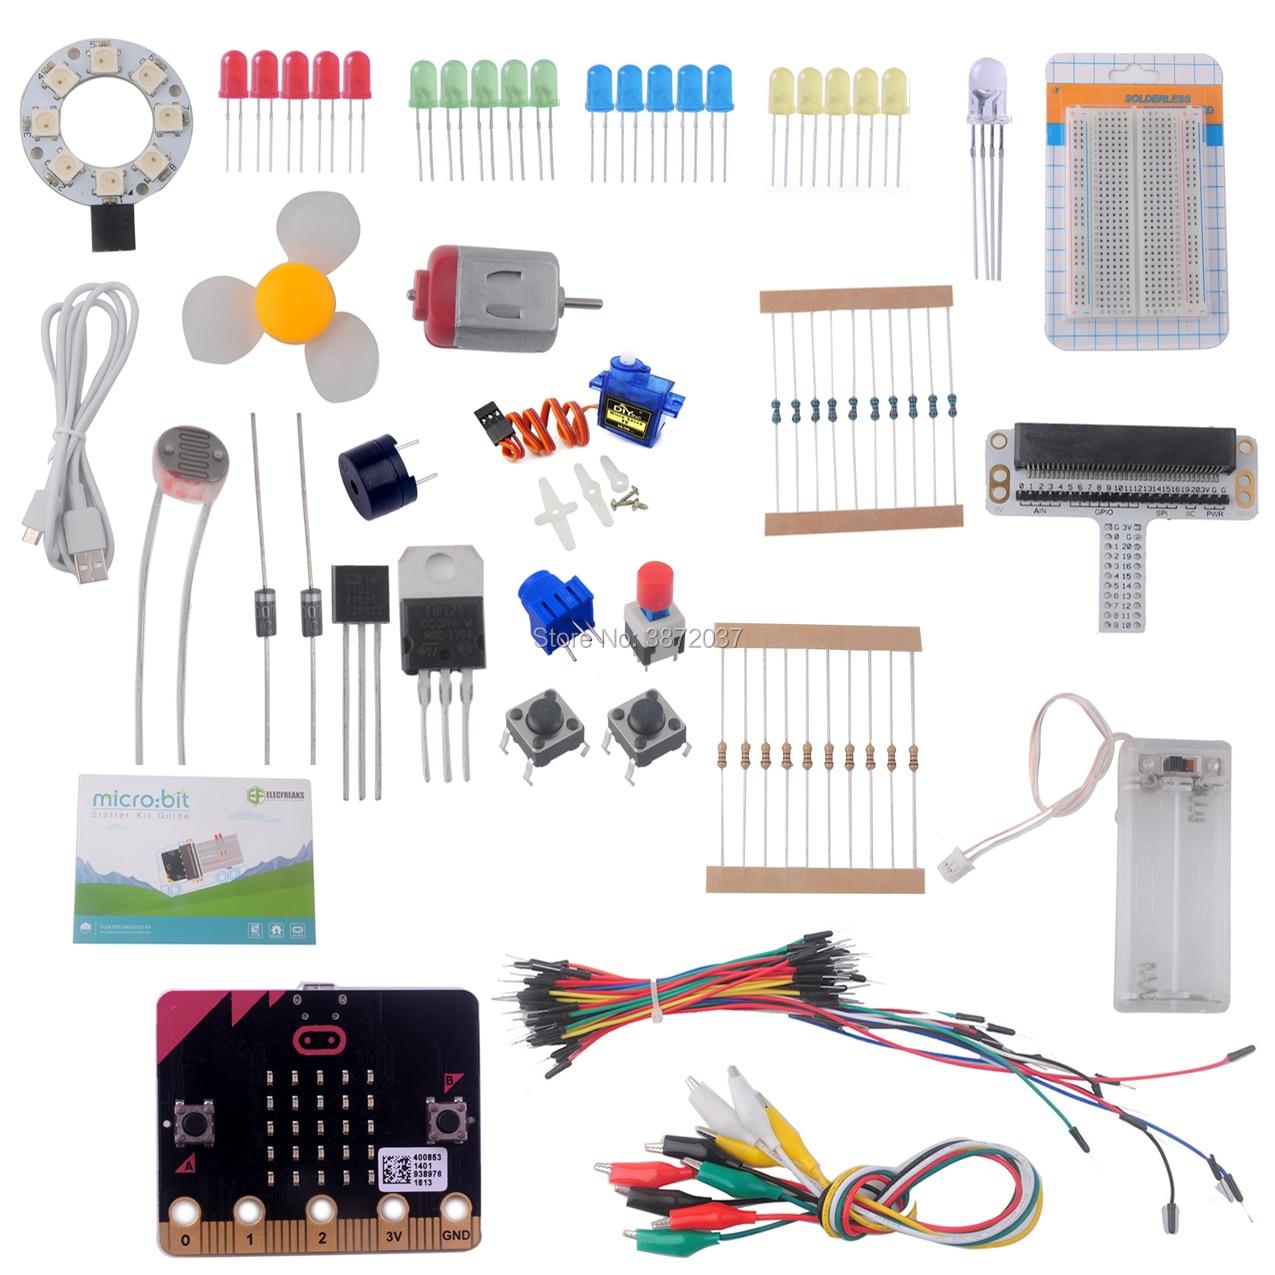 DIY Starter Kit Breadboard Adapter SG-90 Mini Servo TMP36 Temperature Module for BBC Micro:bit Microbit Learning Programming цены